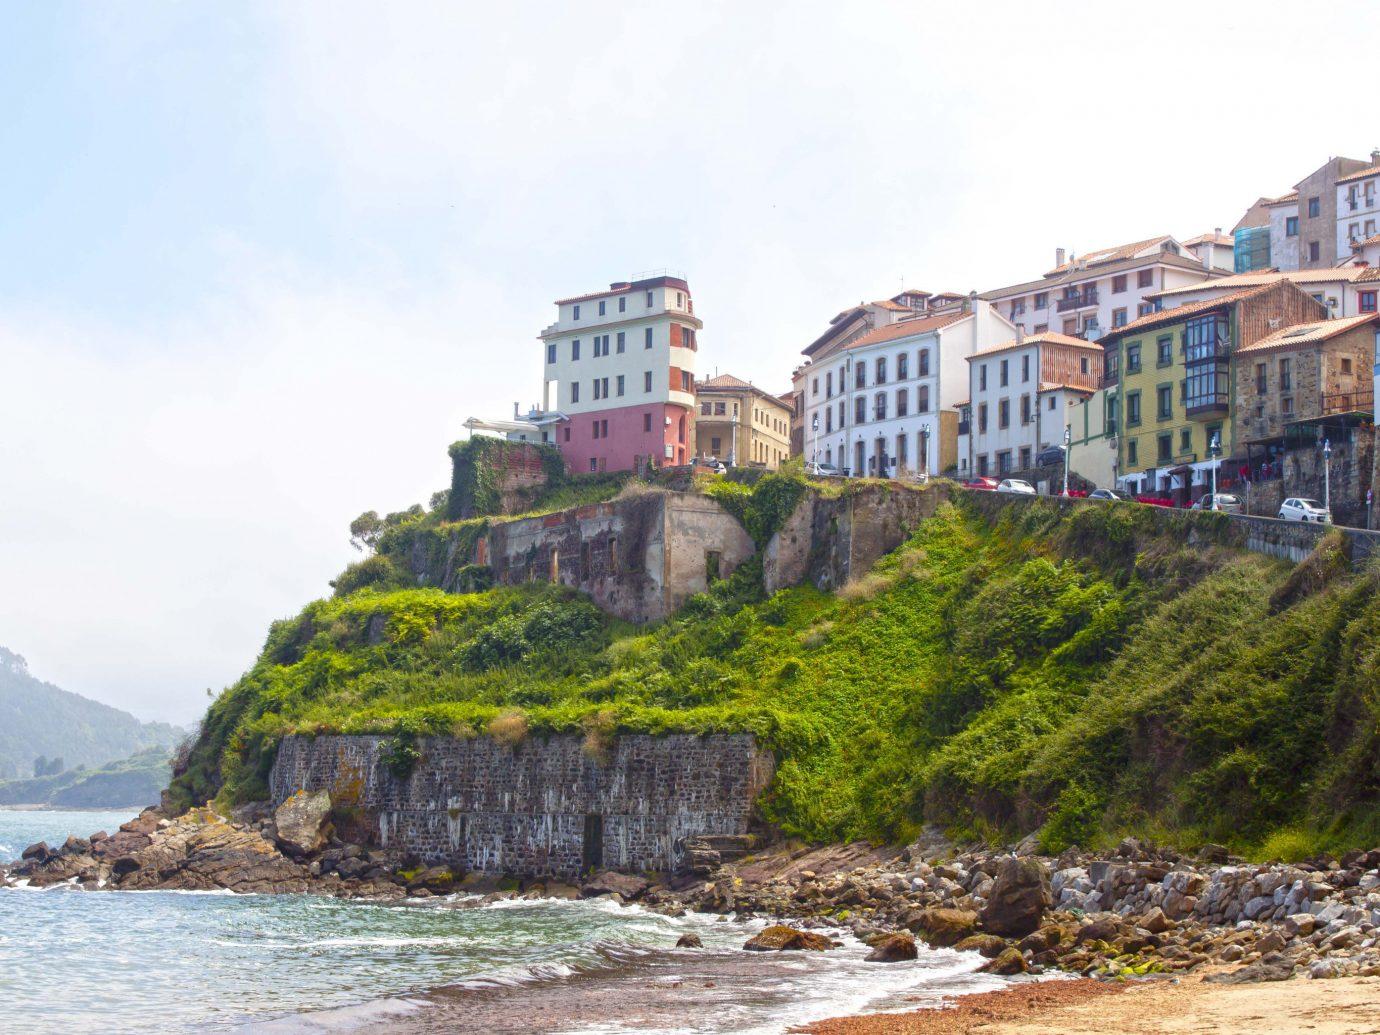 europe Spain Trip Ideas Coast Sea promontory water shore cliff sky terrain coastal and oceanic landforms building tree headland rock house bay City